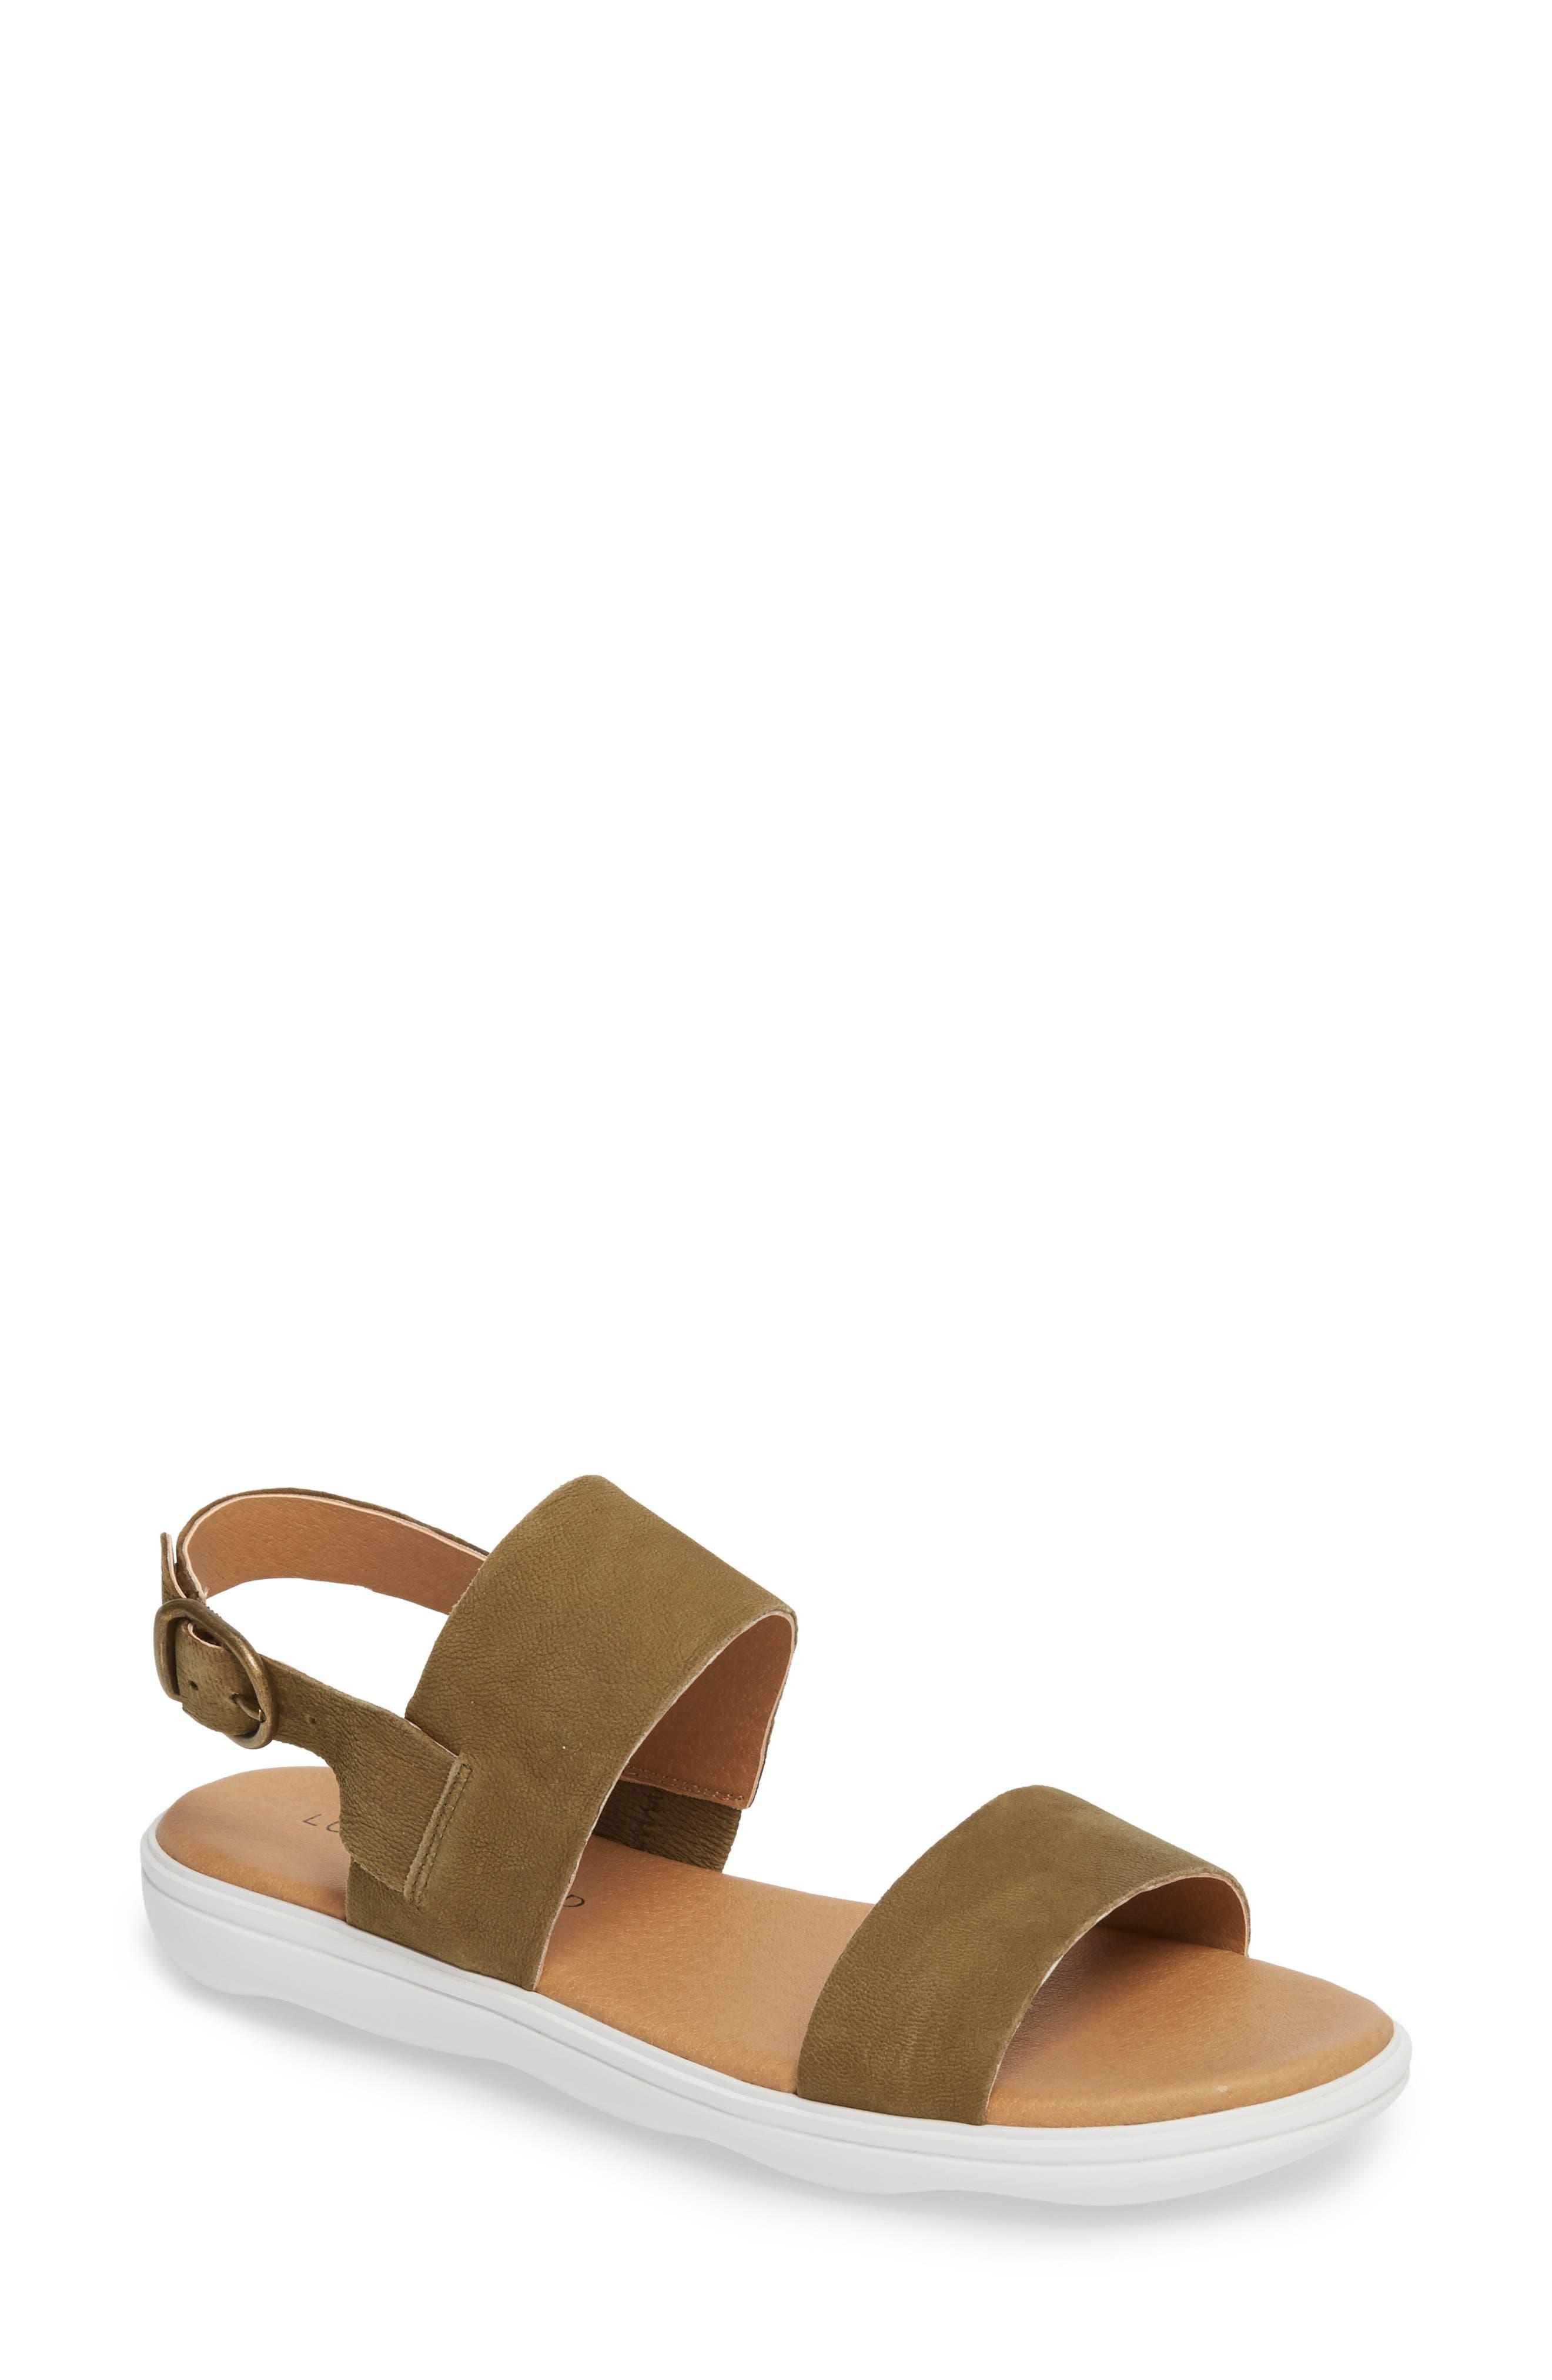 Lucky Brand Madgey Sandals 29HPEn